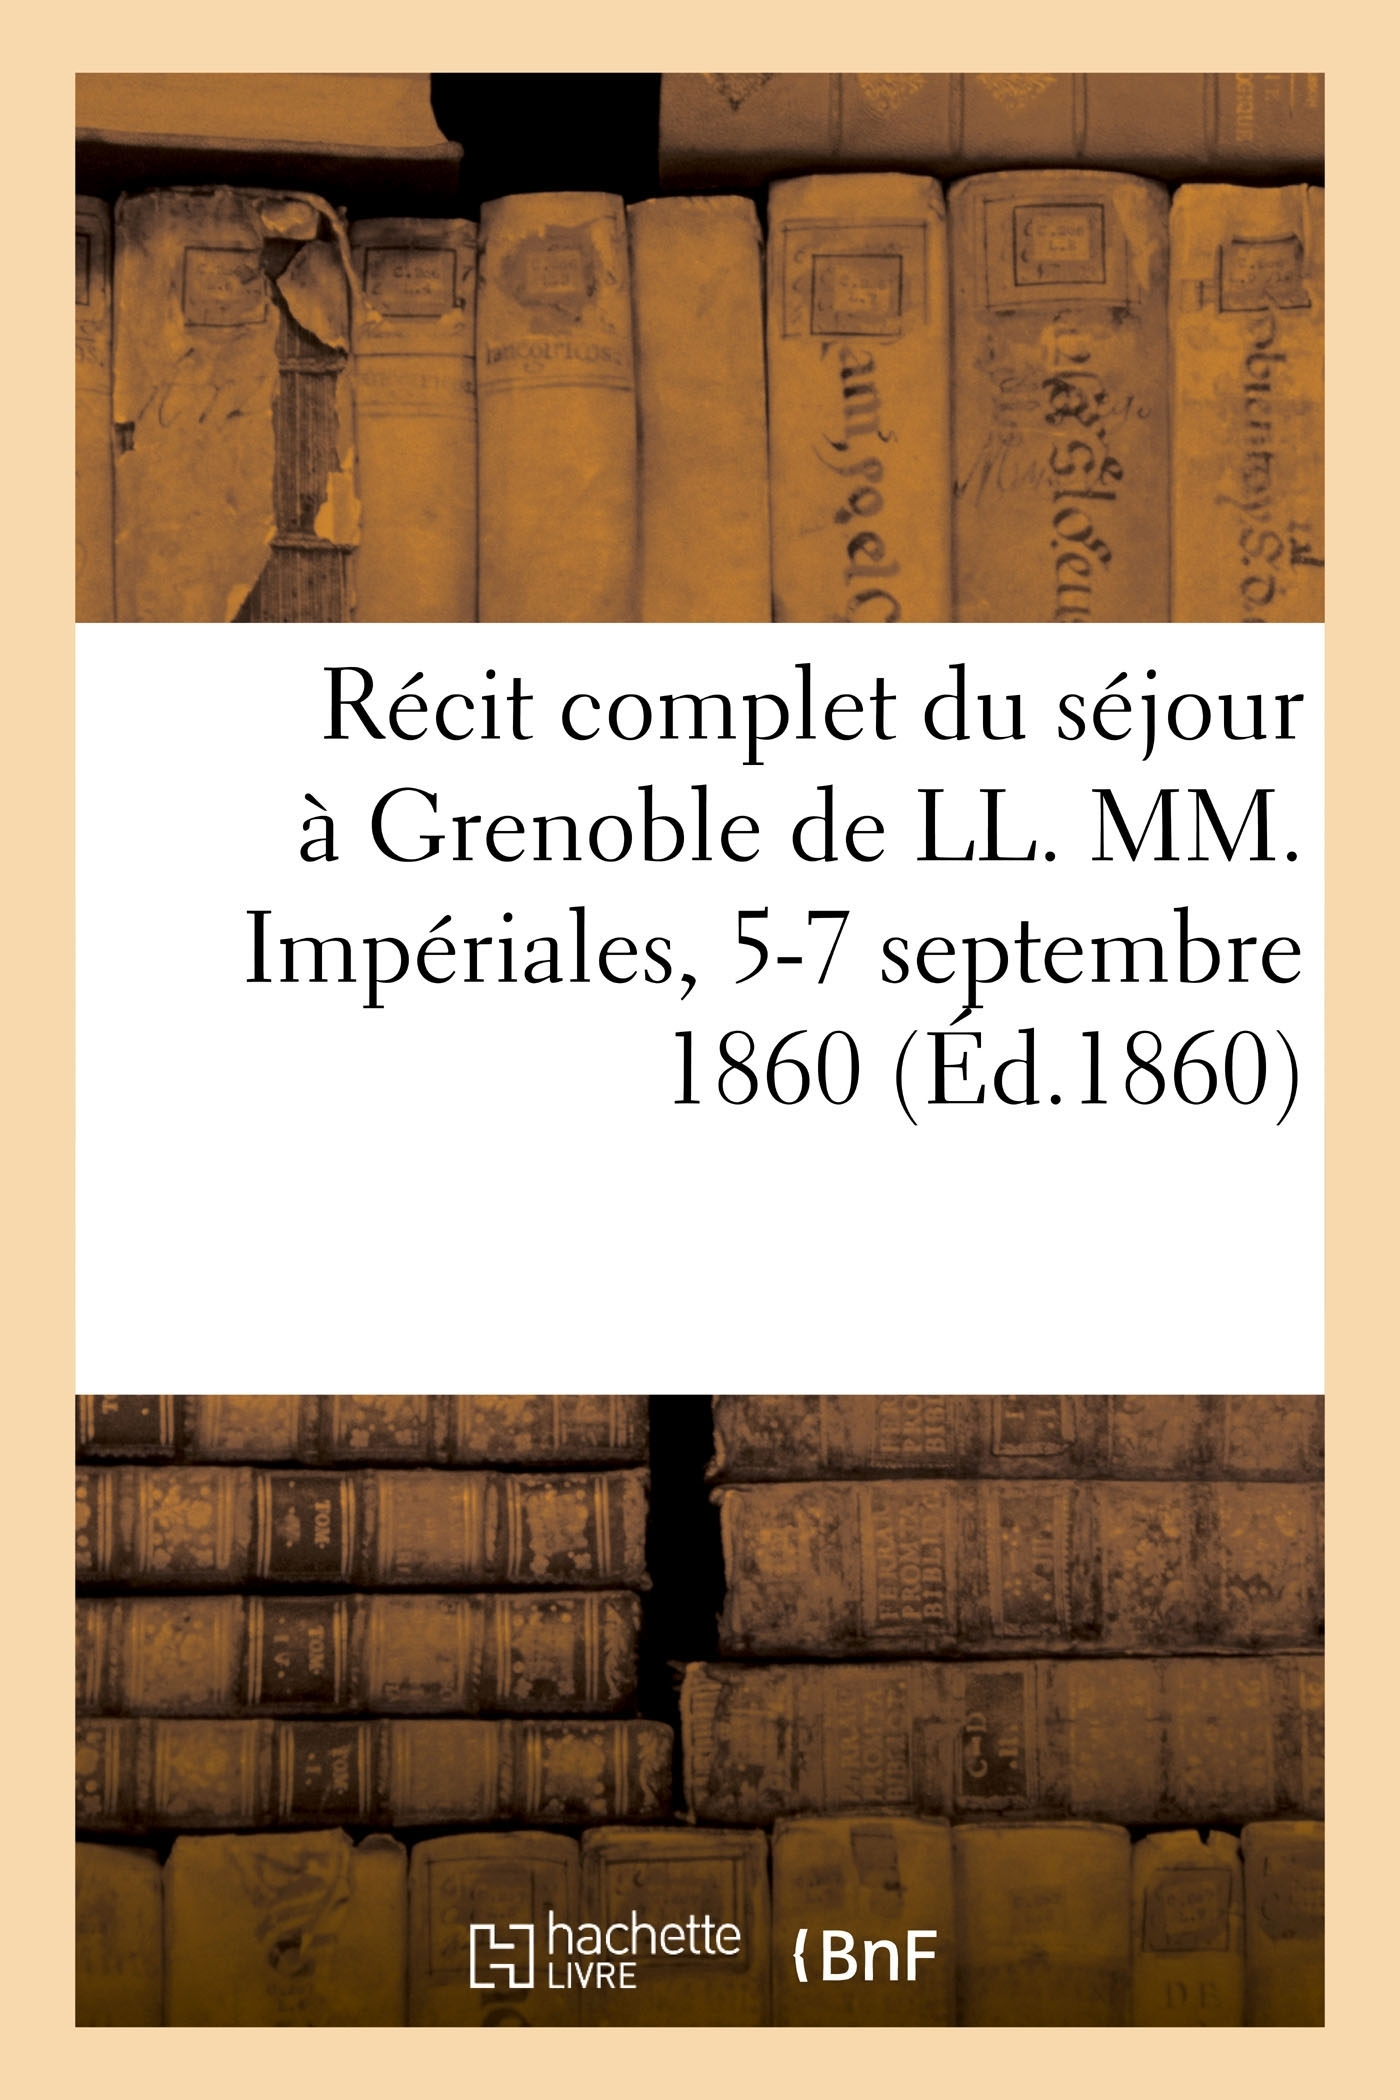 RECIT COMPLET DU SEJOUR A GRENOBLE DE LL. MM. IMPERIALES, 5-7 SEPTEMBRE 1860